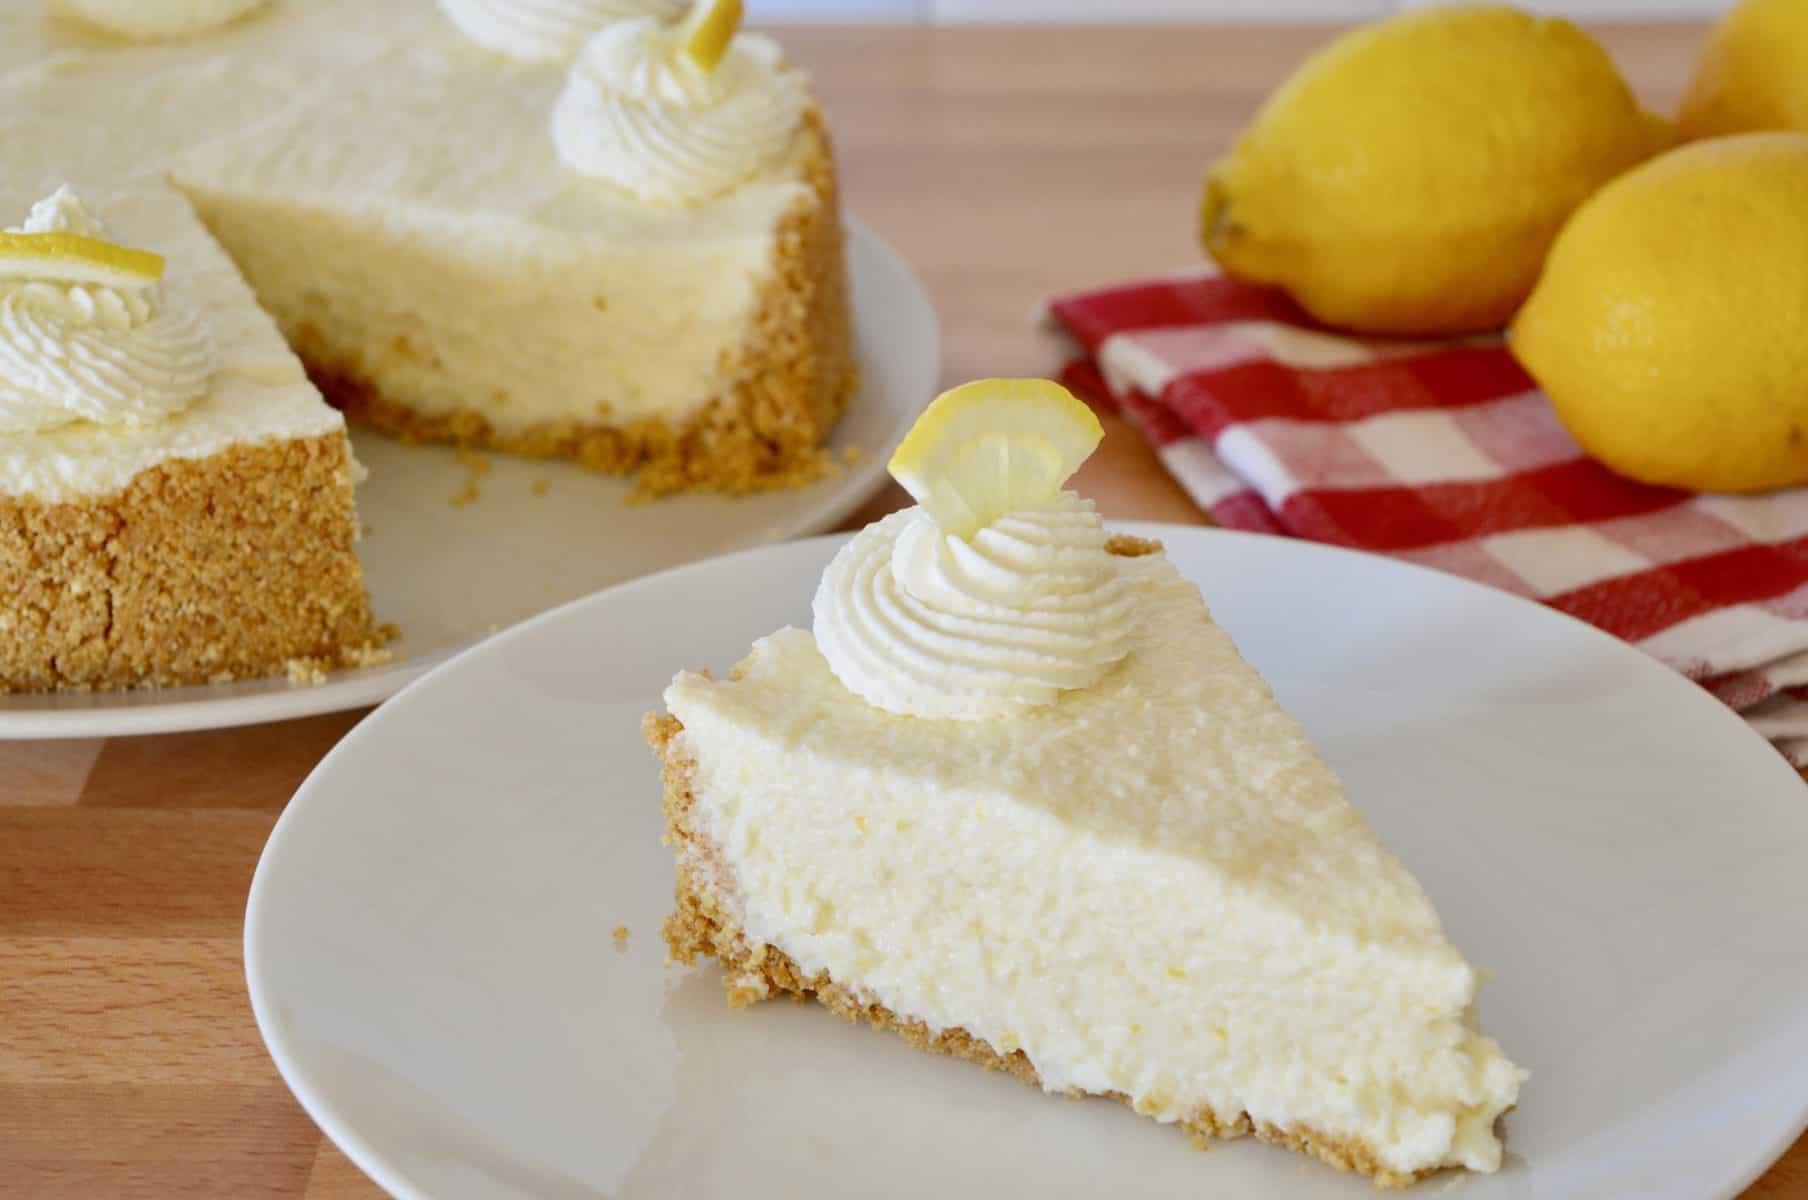 No-Bake Lemon Mascarpone Cheesecake sliced on a plate.